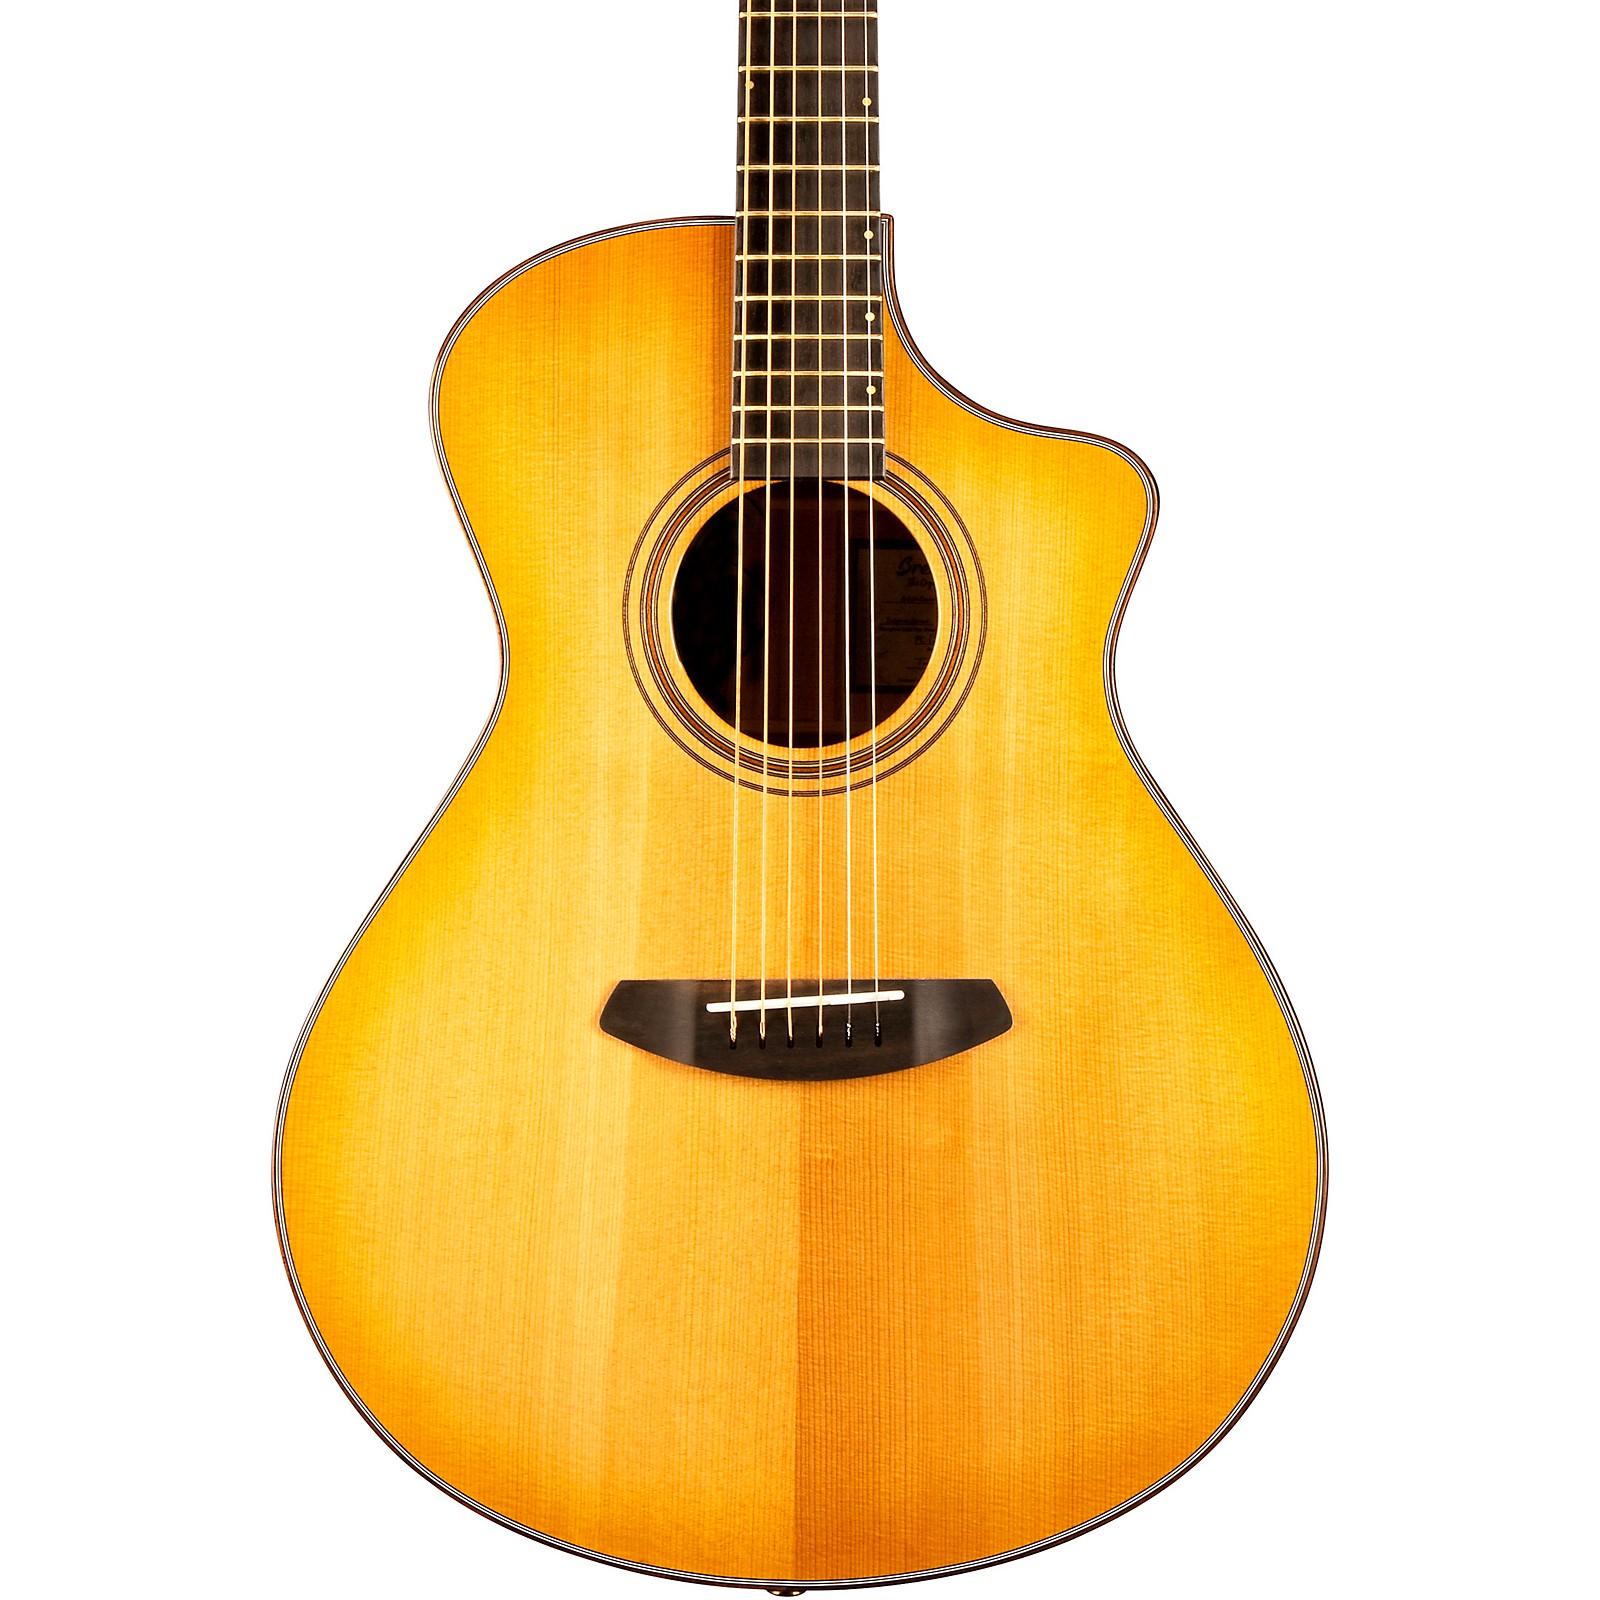 Breedlove Organic Collection Artista Concert Cutaway CE Acoustic-Electric Guitar